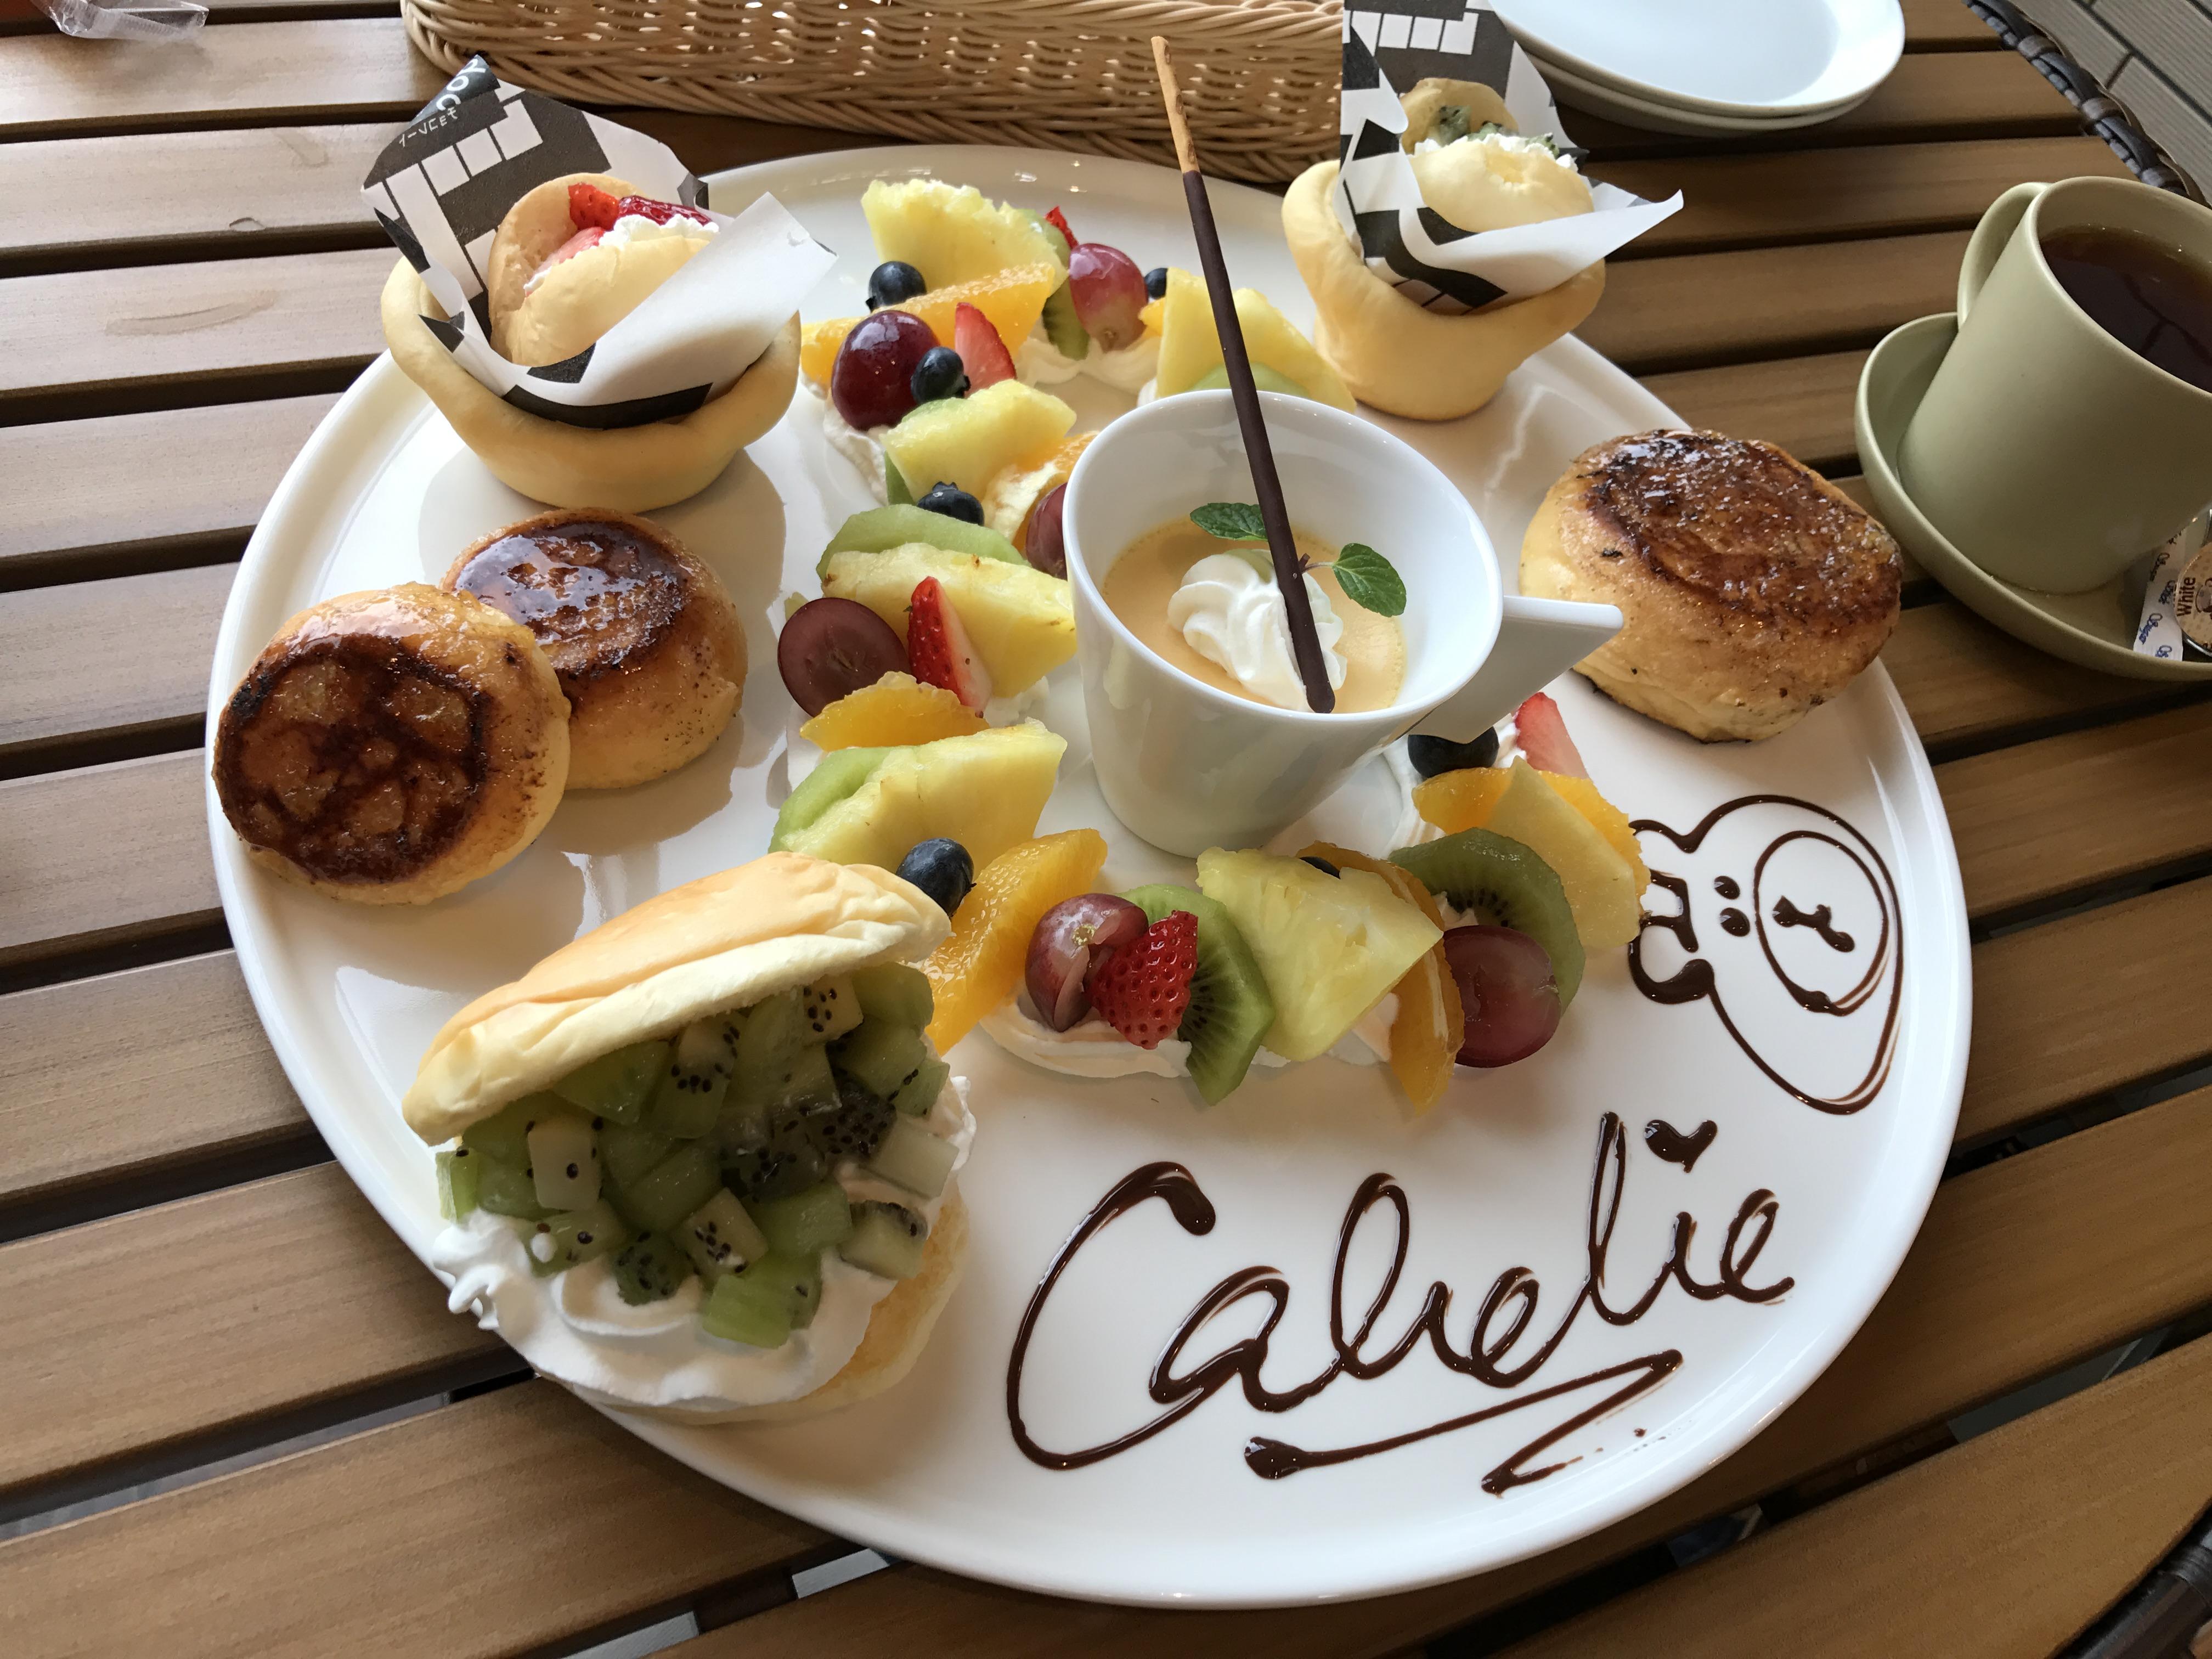 【Love 広島】クリームパンで有名な八天堂のカフェがある!?「Hattendo Cafelie」に行ってみた